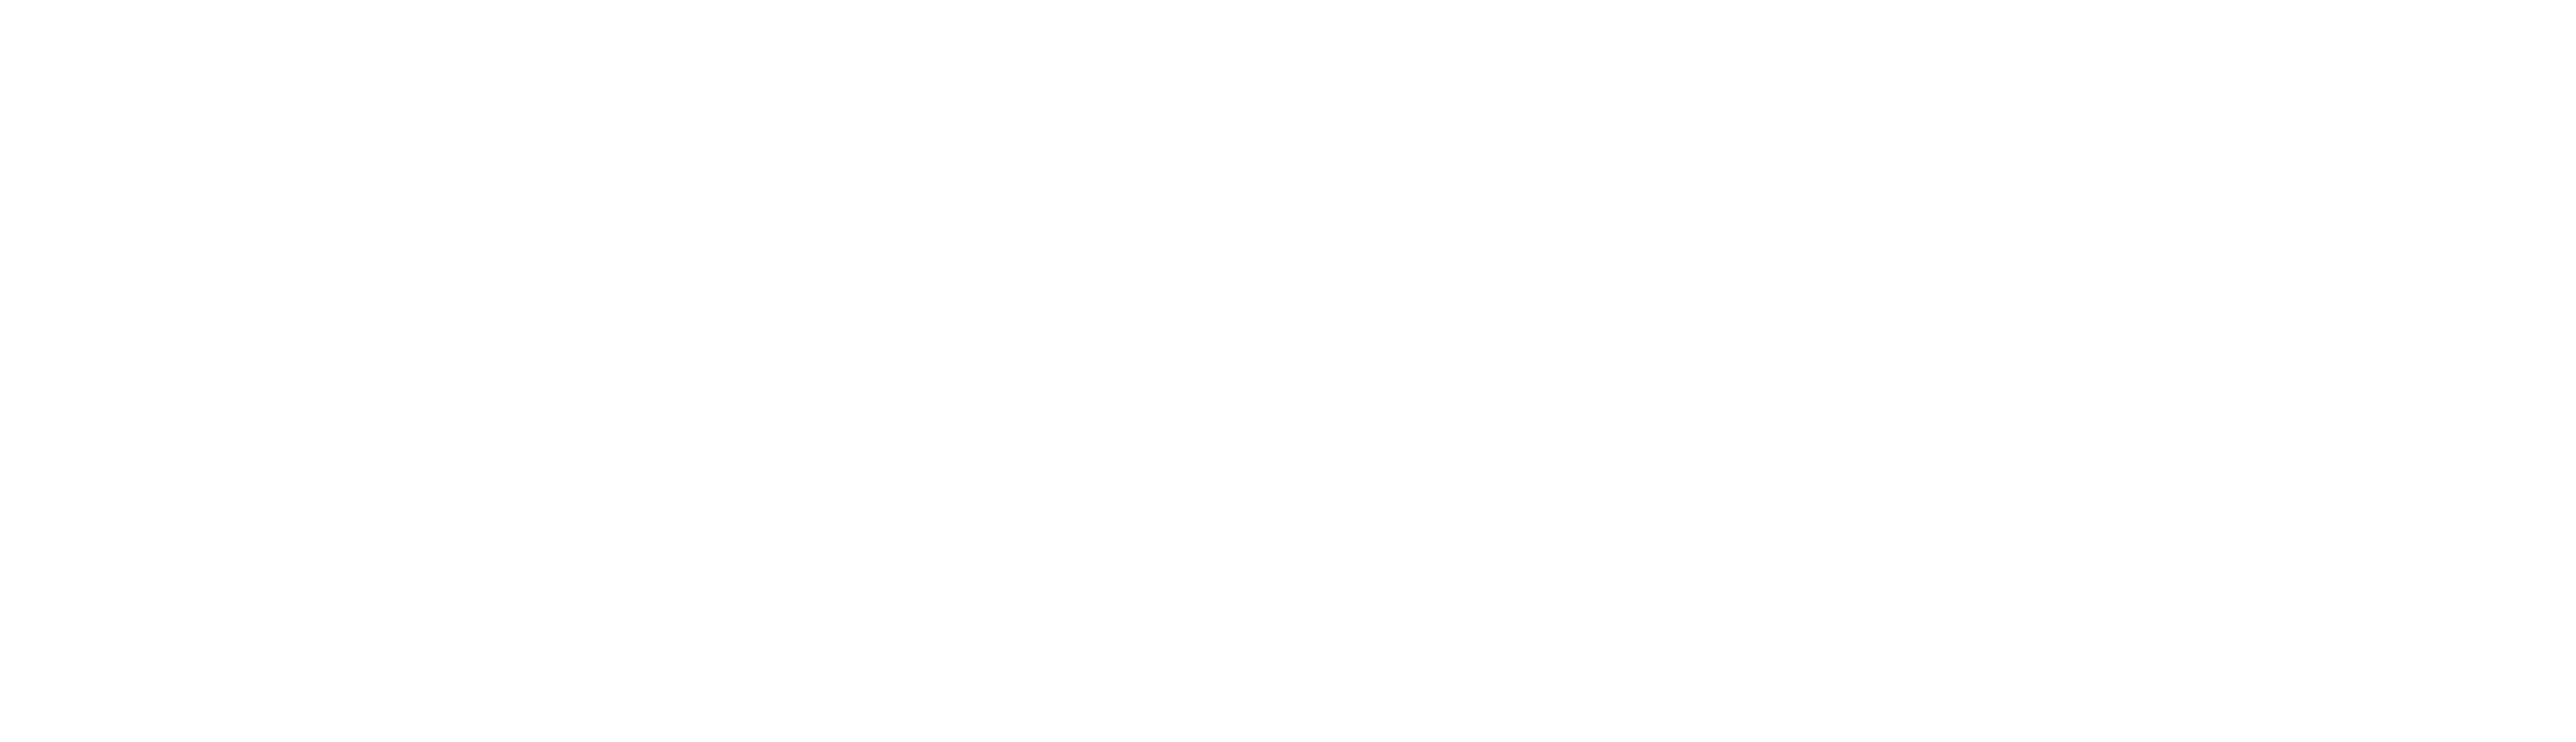 52 Orduspor Futbol Kulübü Store